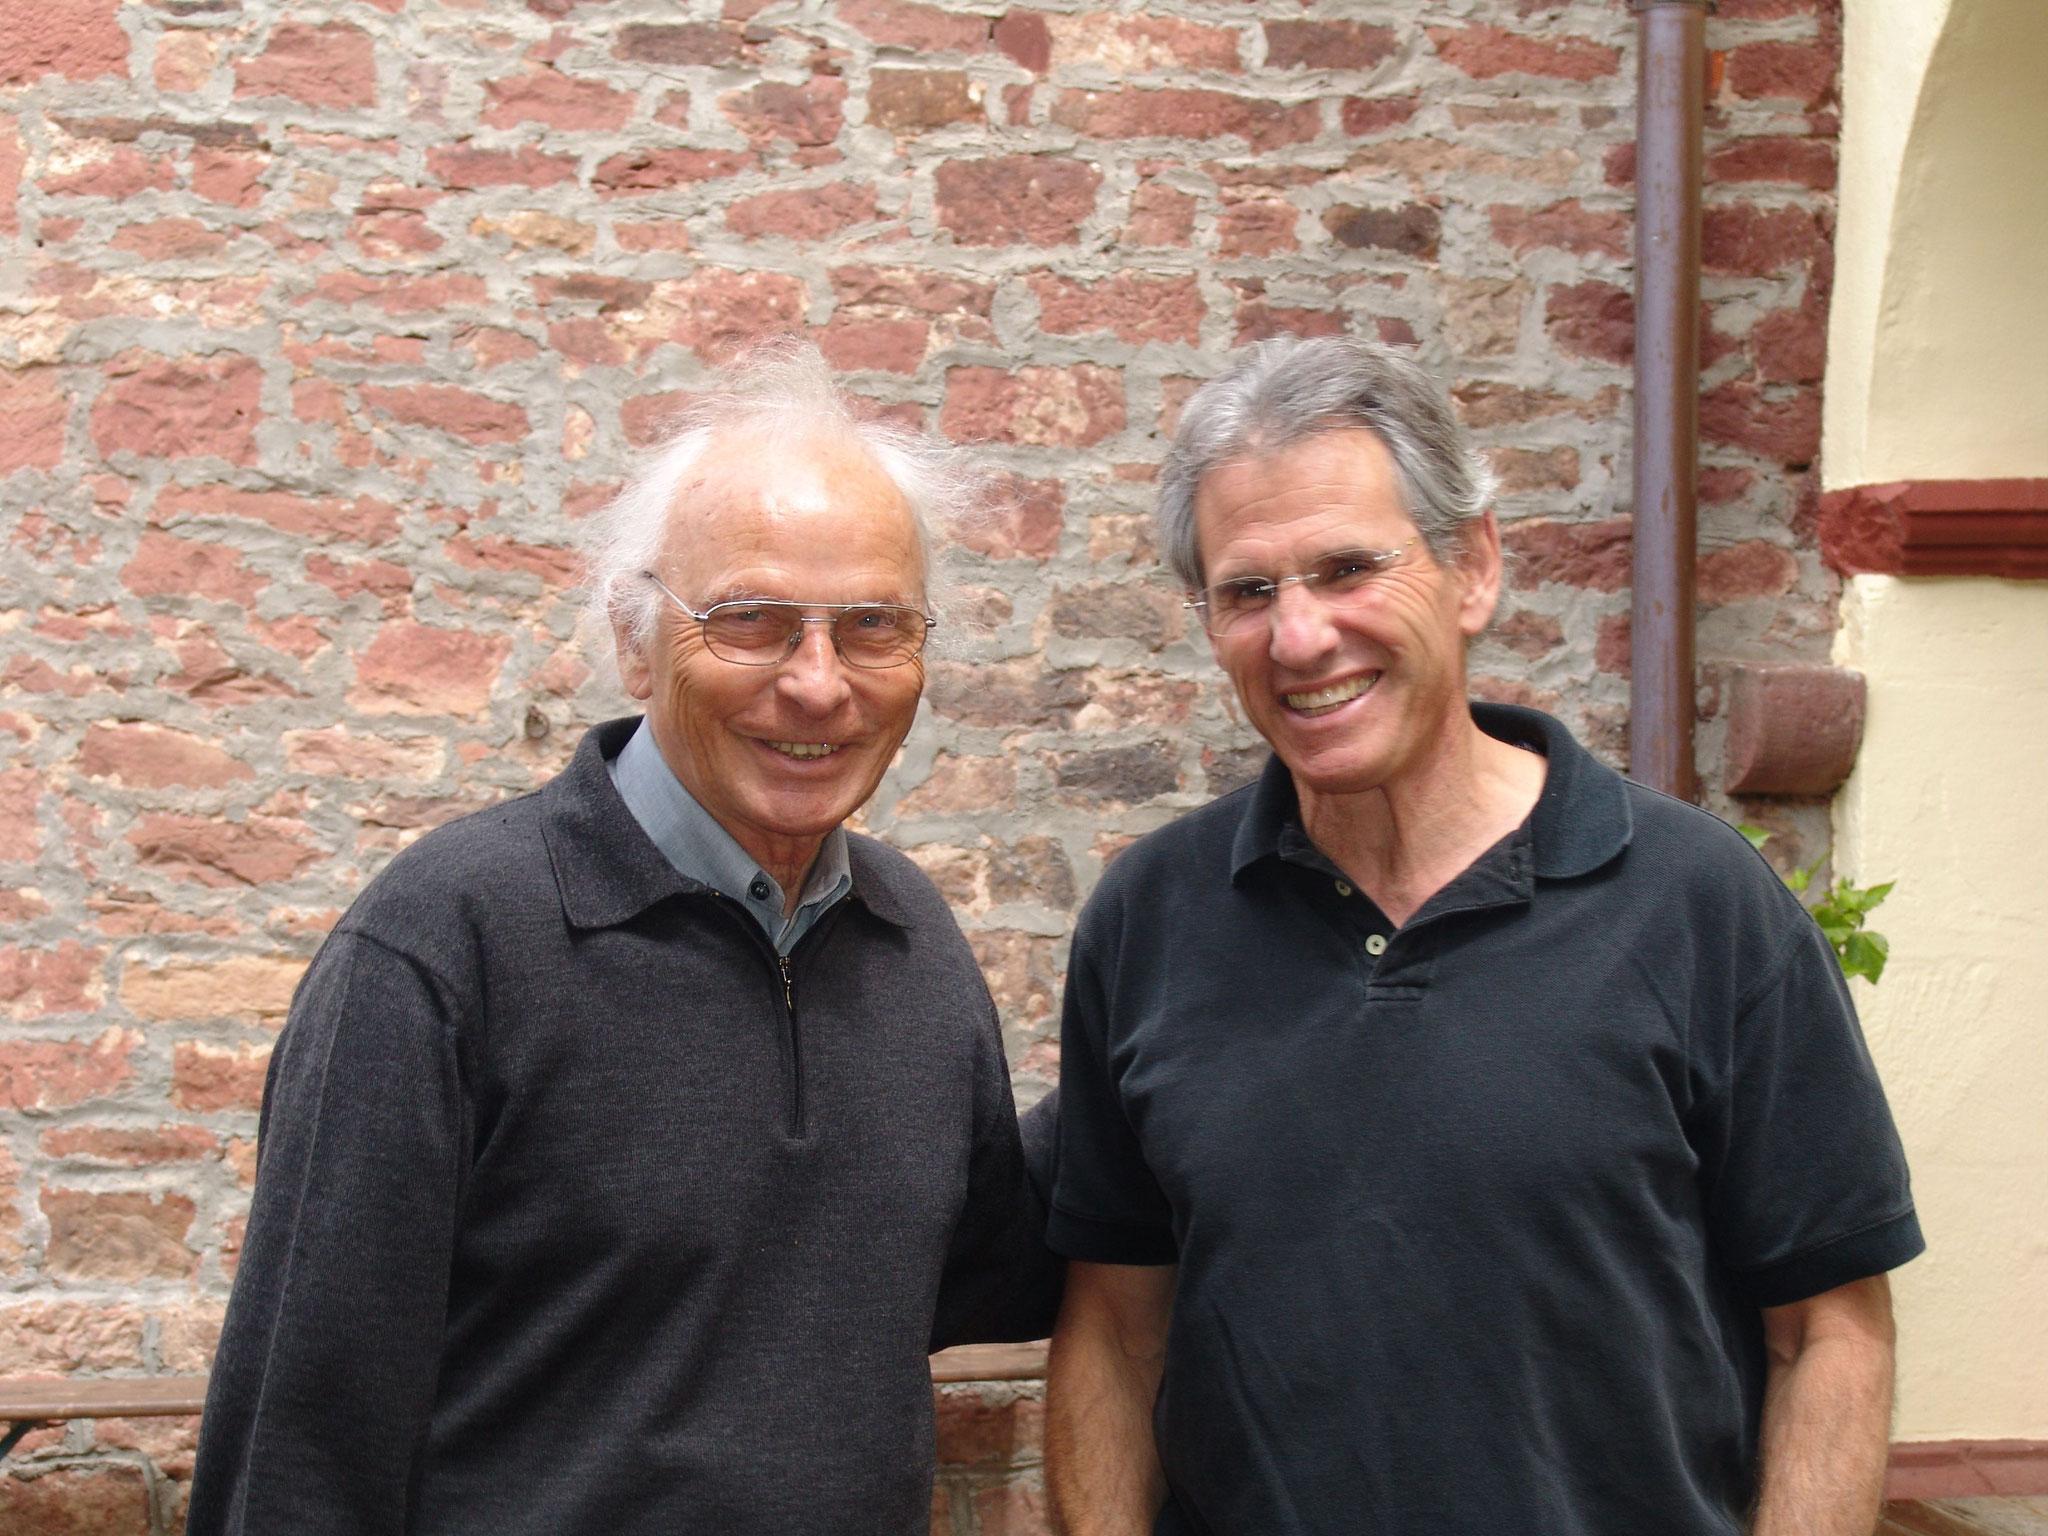 Willgis Jäger (links) und Dr. Jon Kabat-Zinn